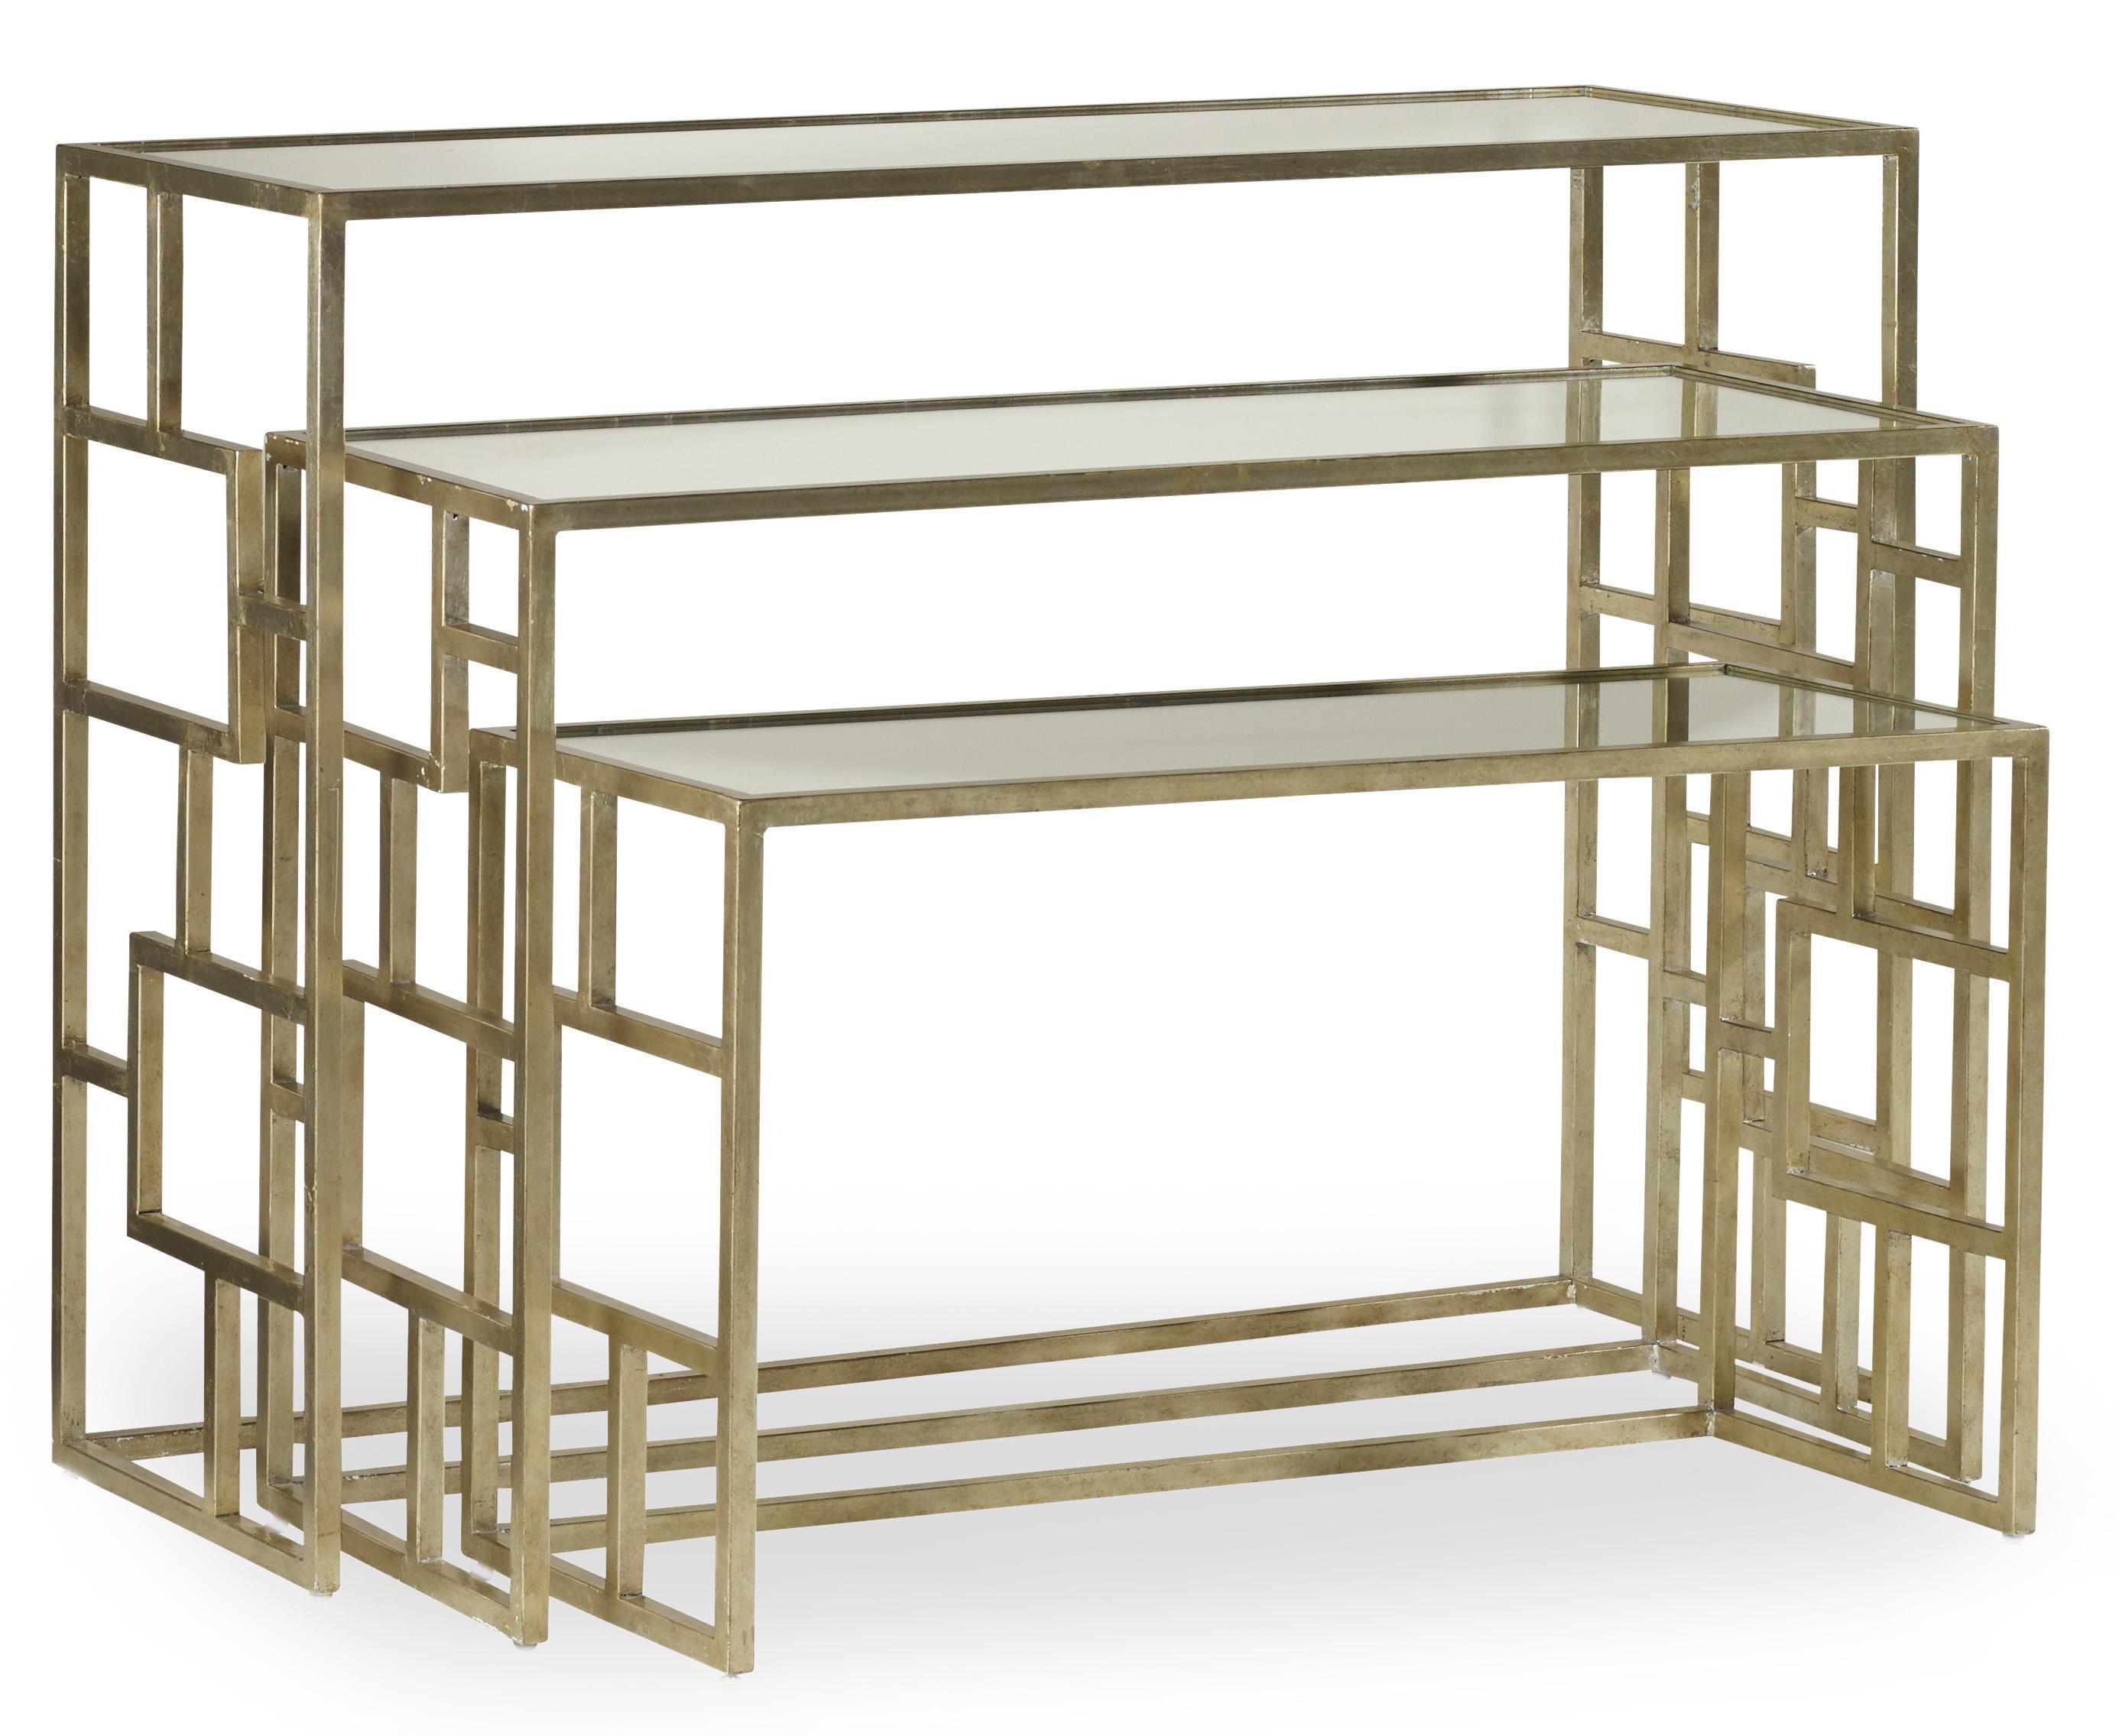 Hooker Furniture Living Room Accents Metal Nest of Tables - Item Number: 500-50-939